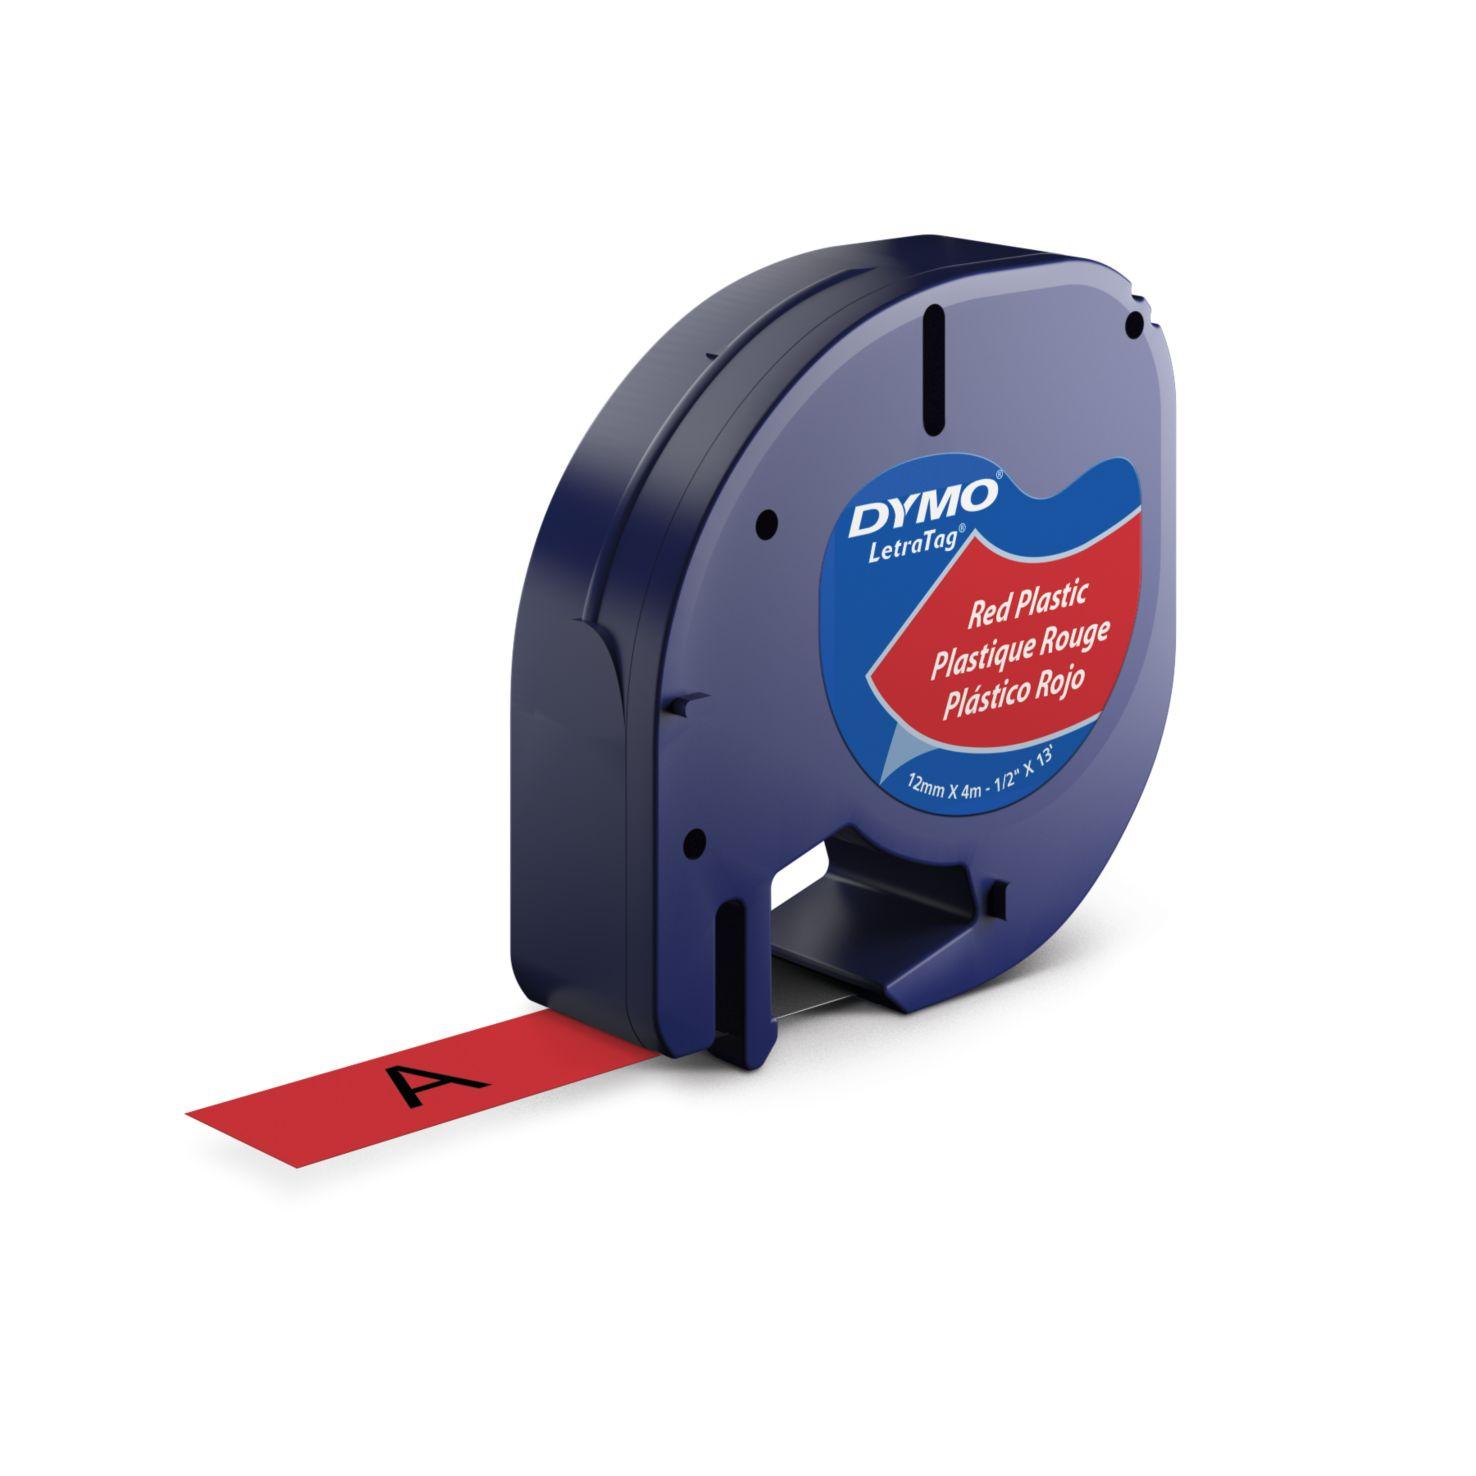 Dymo Letra Tag-Schriftband Plastik 12mm x 4m schwarz auf rot